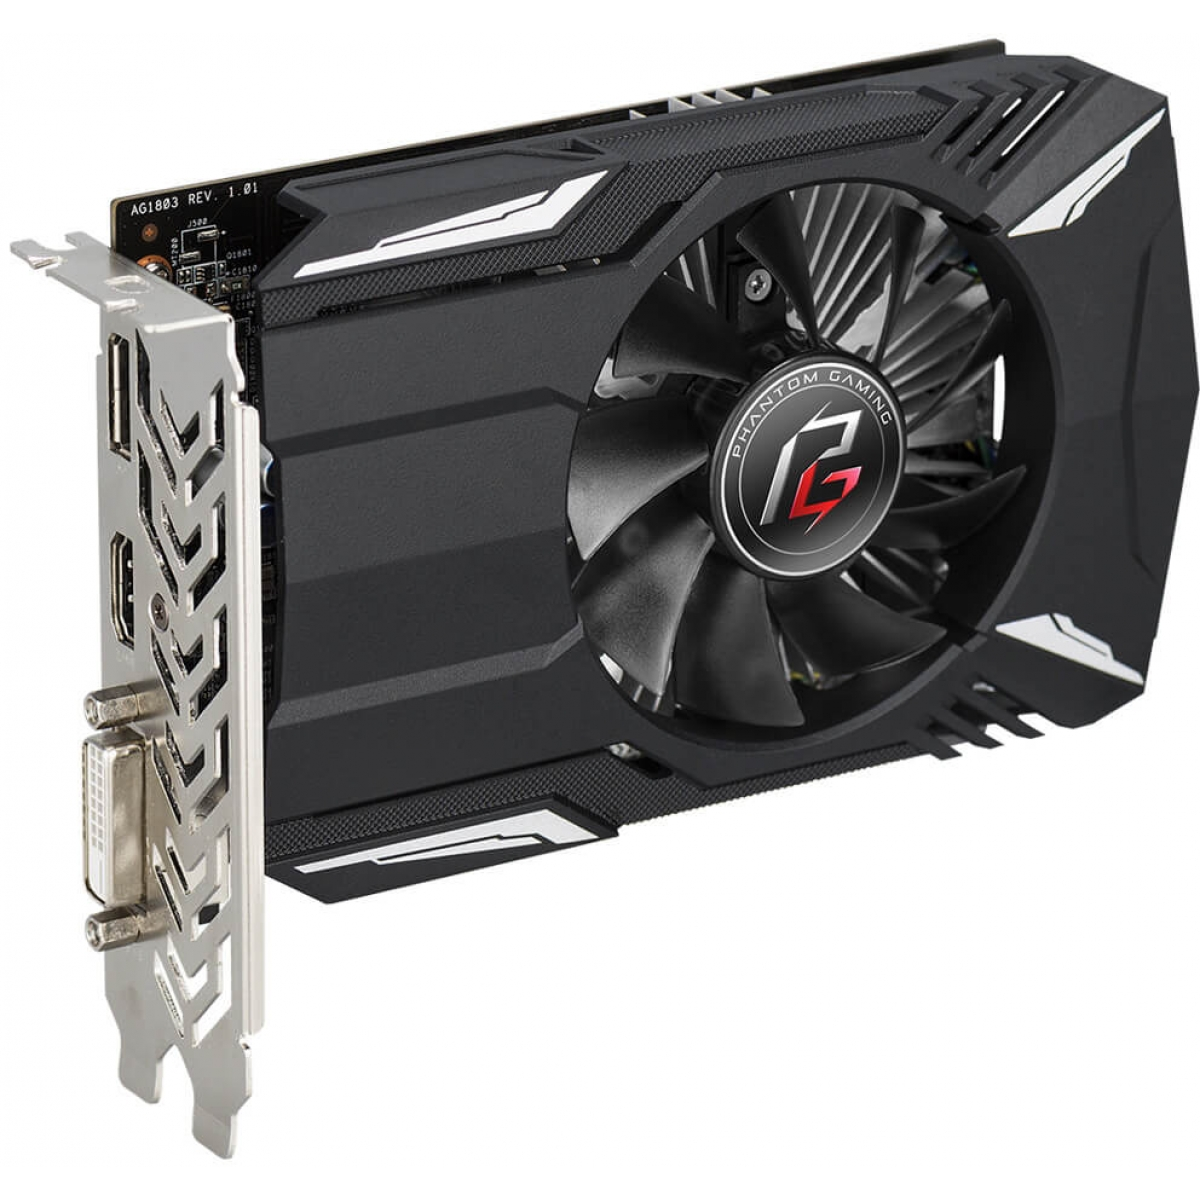 Placa de Vídeo Asrock Radeon RX 560 Phantom, 4GB GDDR5, 128Bit